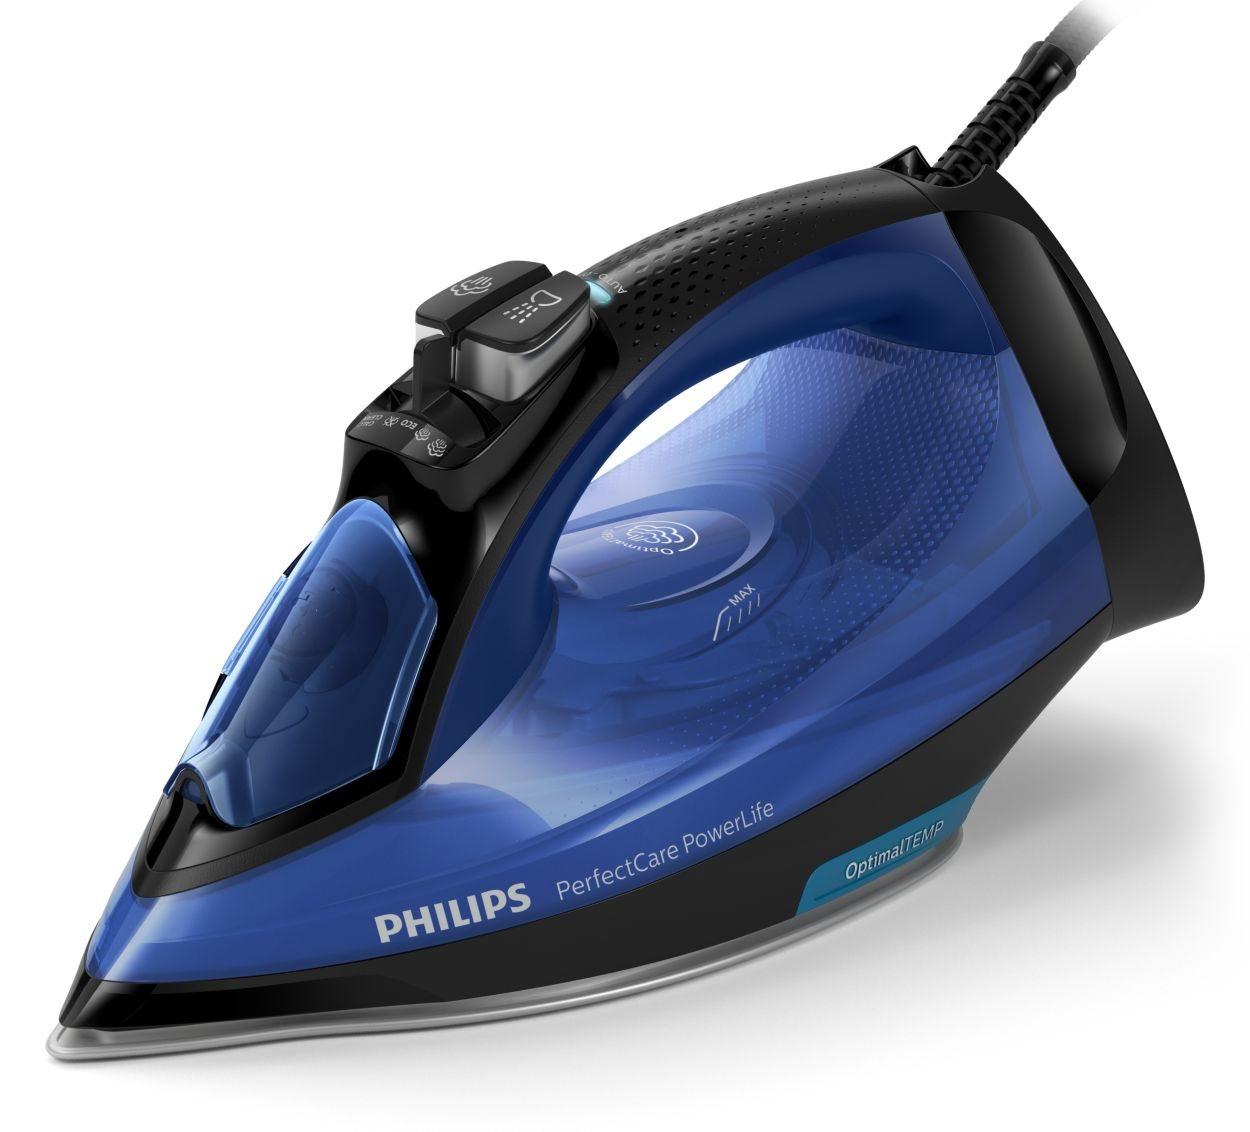 Philips σιδερό ατμού GC3920/20